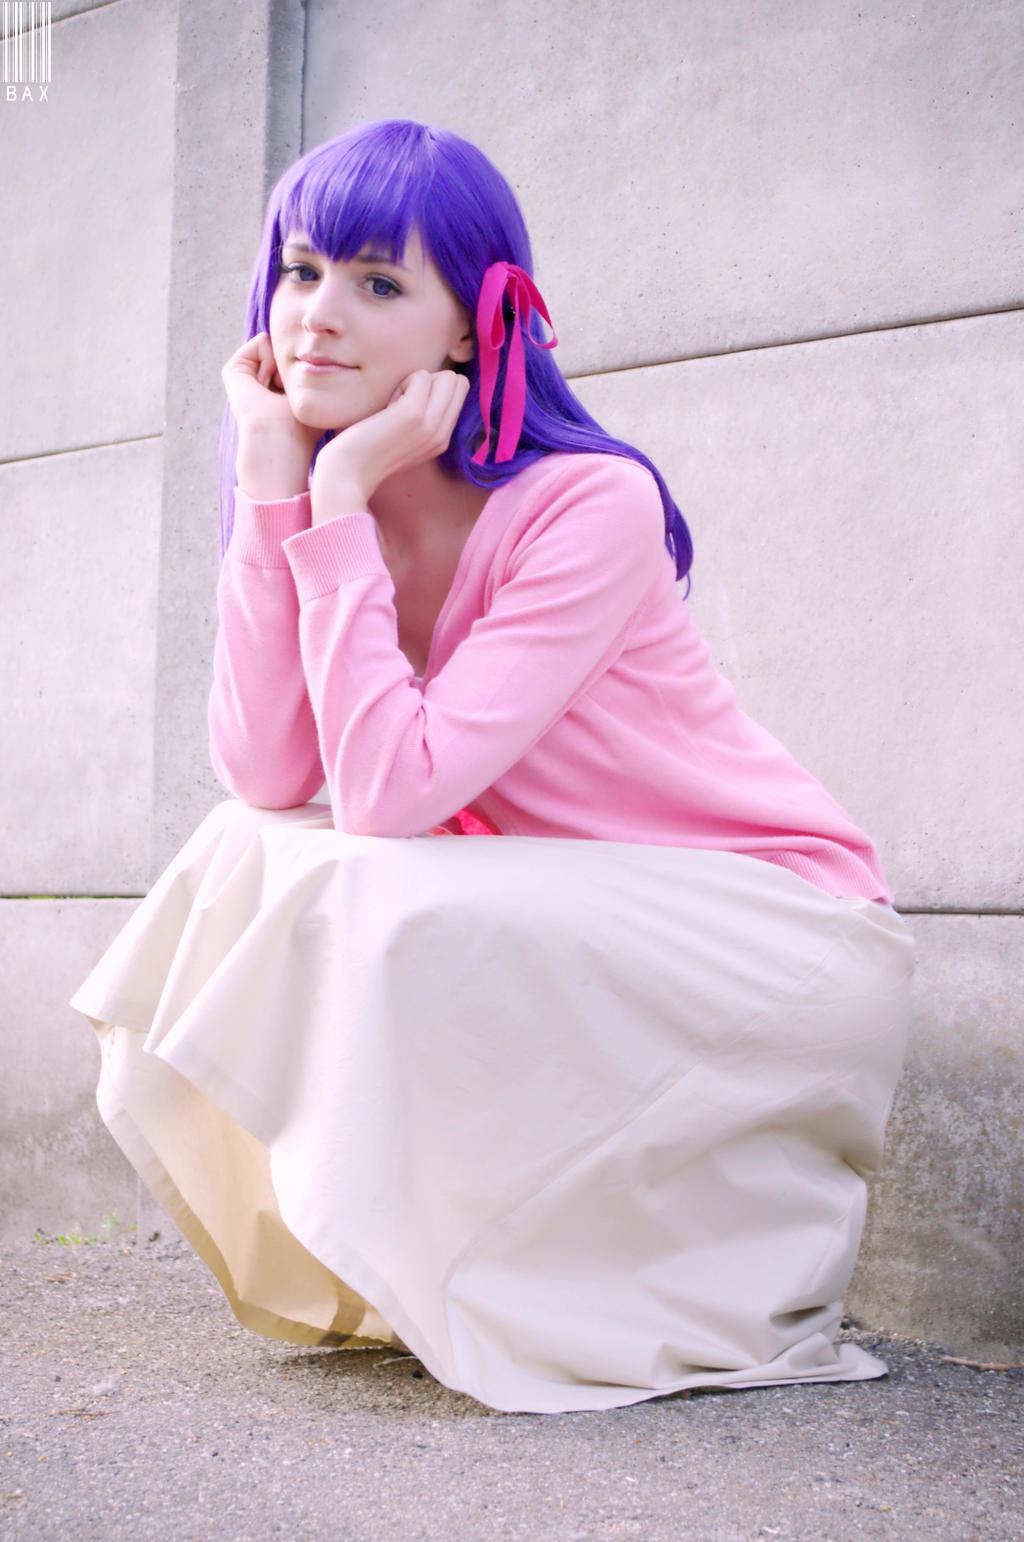 Sakura Matou - Fate/stay night Cosplay